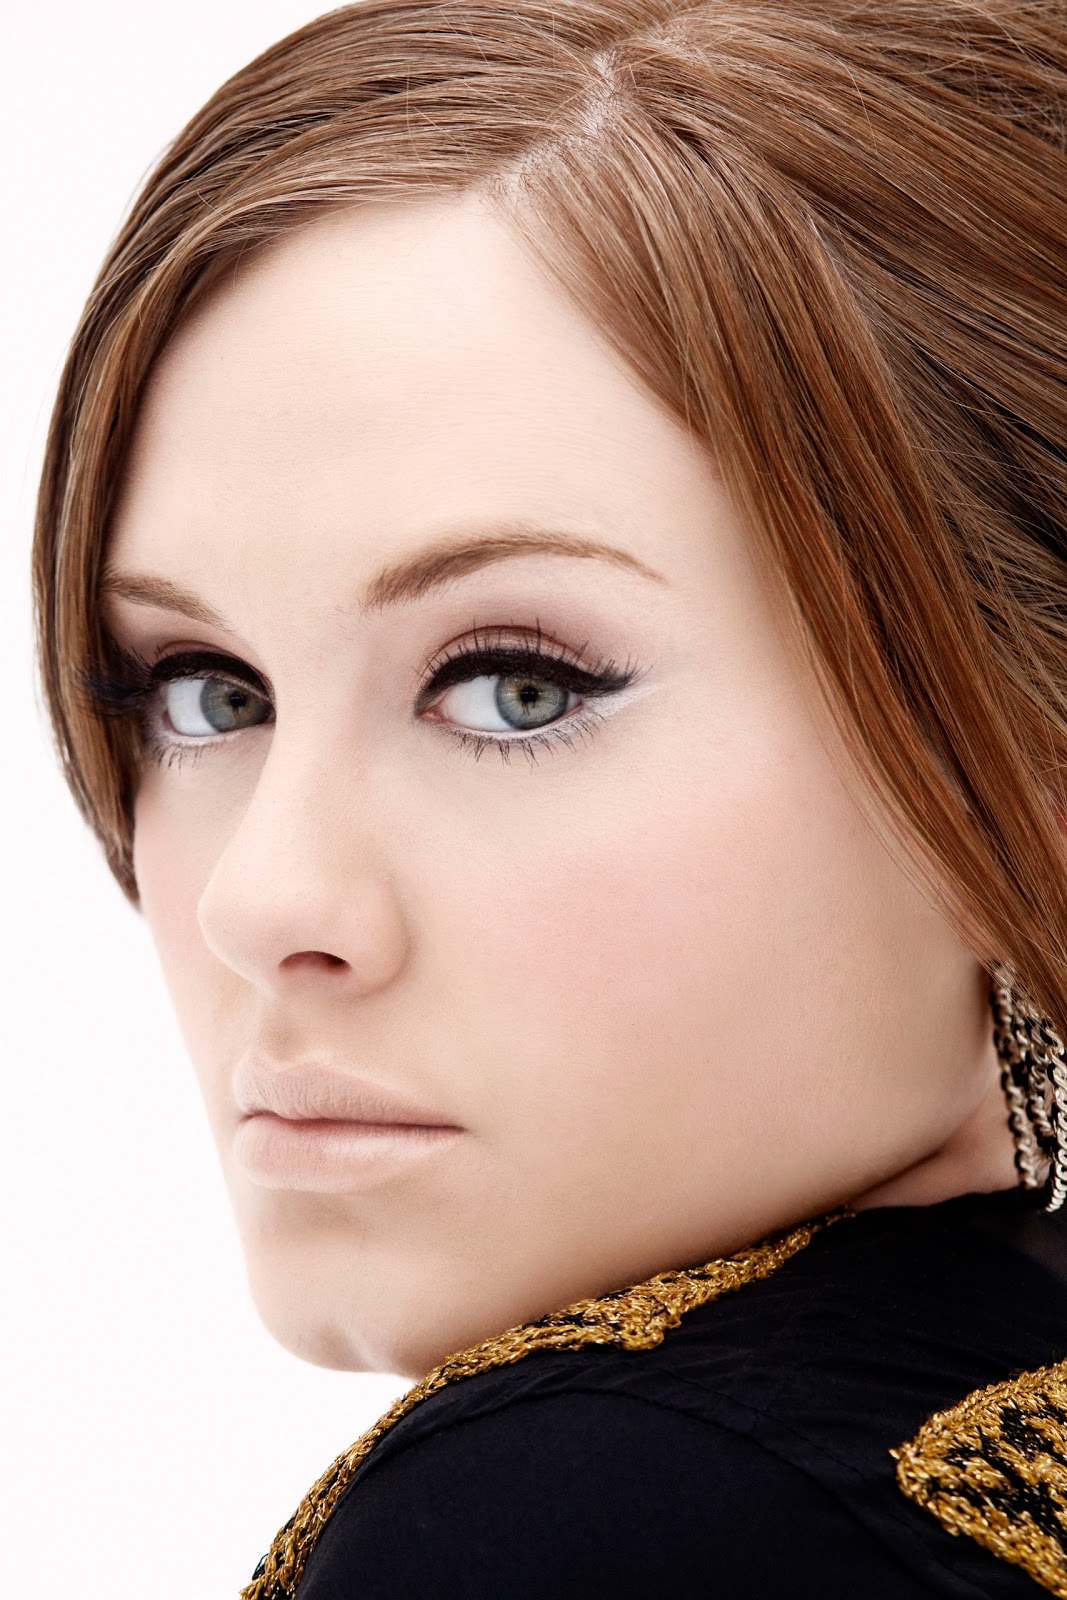 http://3.bp.blogspot.com/-AY-S3S6sfRM/Tv8hgL9B-qI/AAAAAAAADR4/G0mXa_XleB4/s1600/Rolling+In+The+Deep+por+Adele.jpg